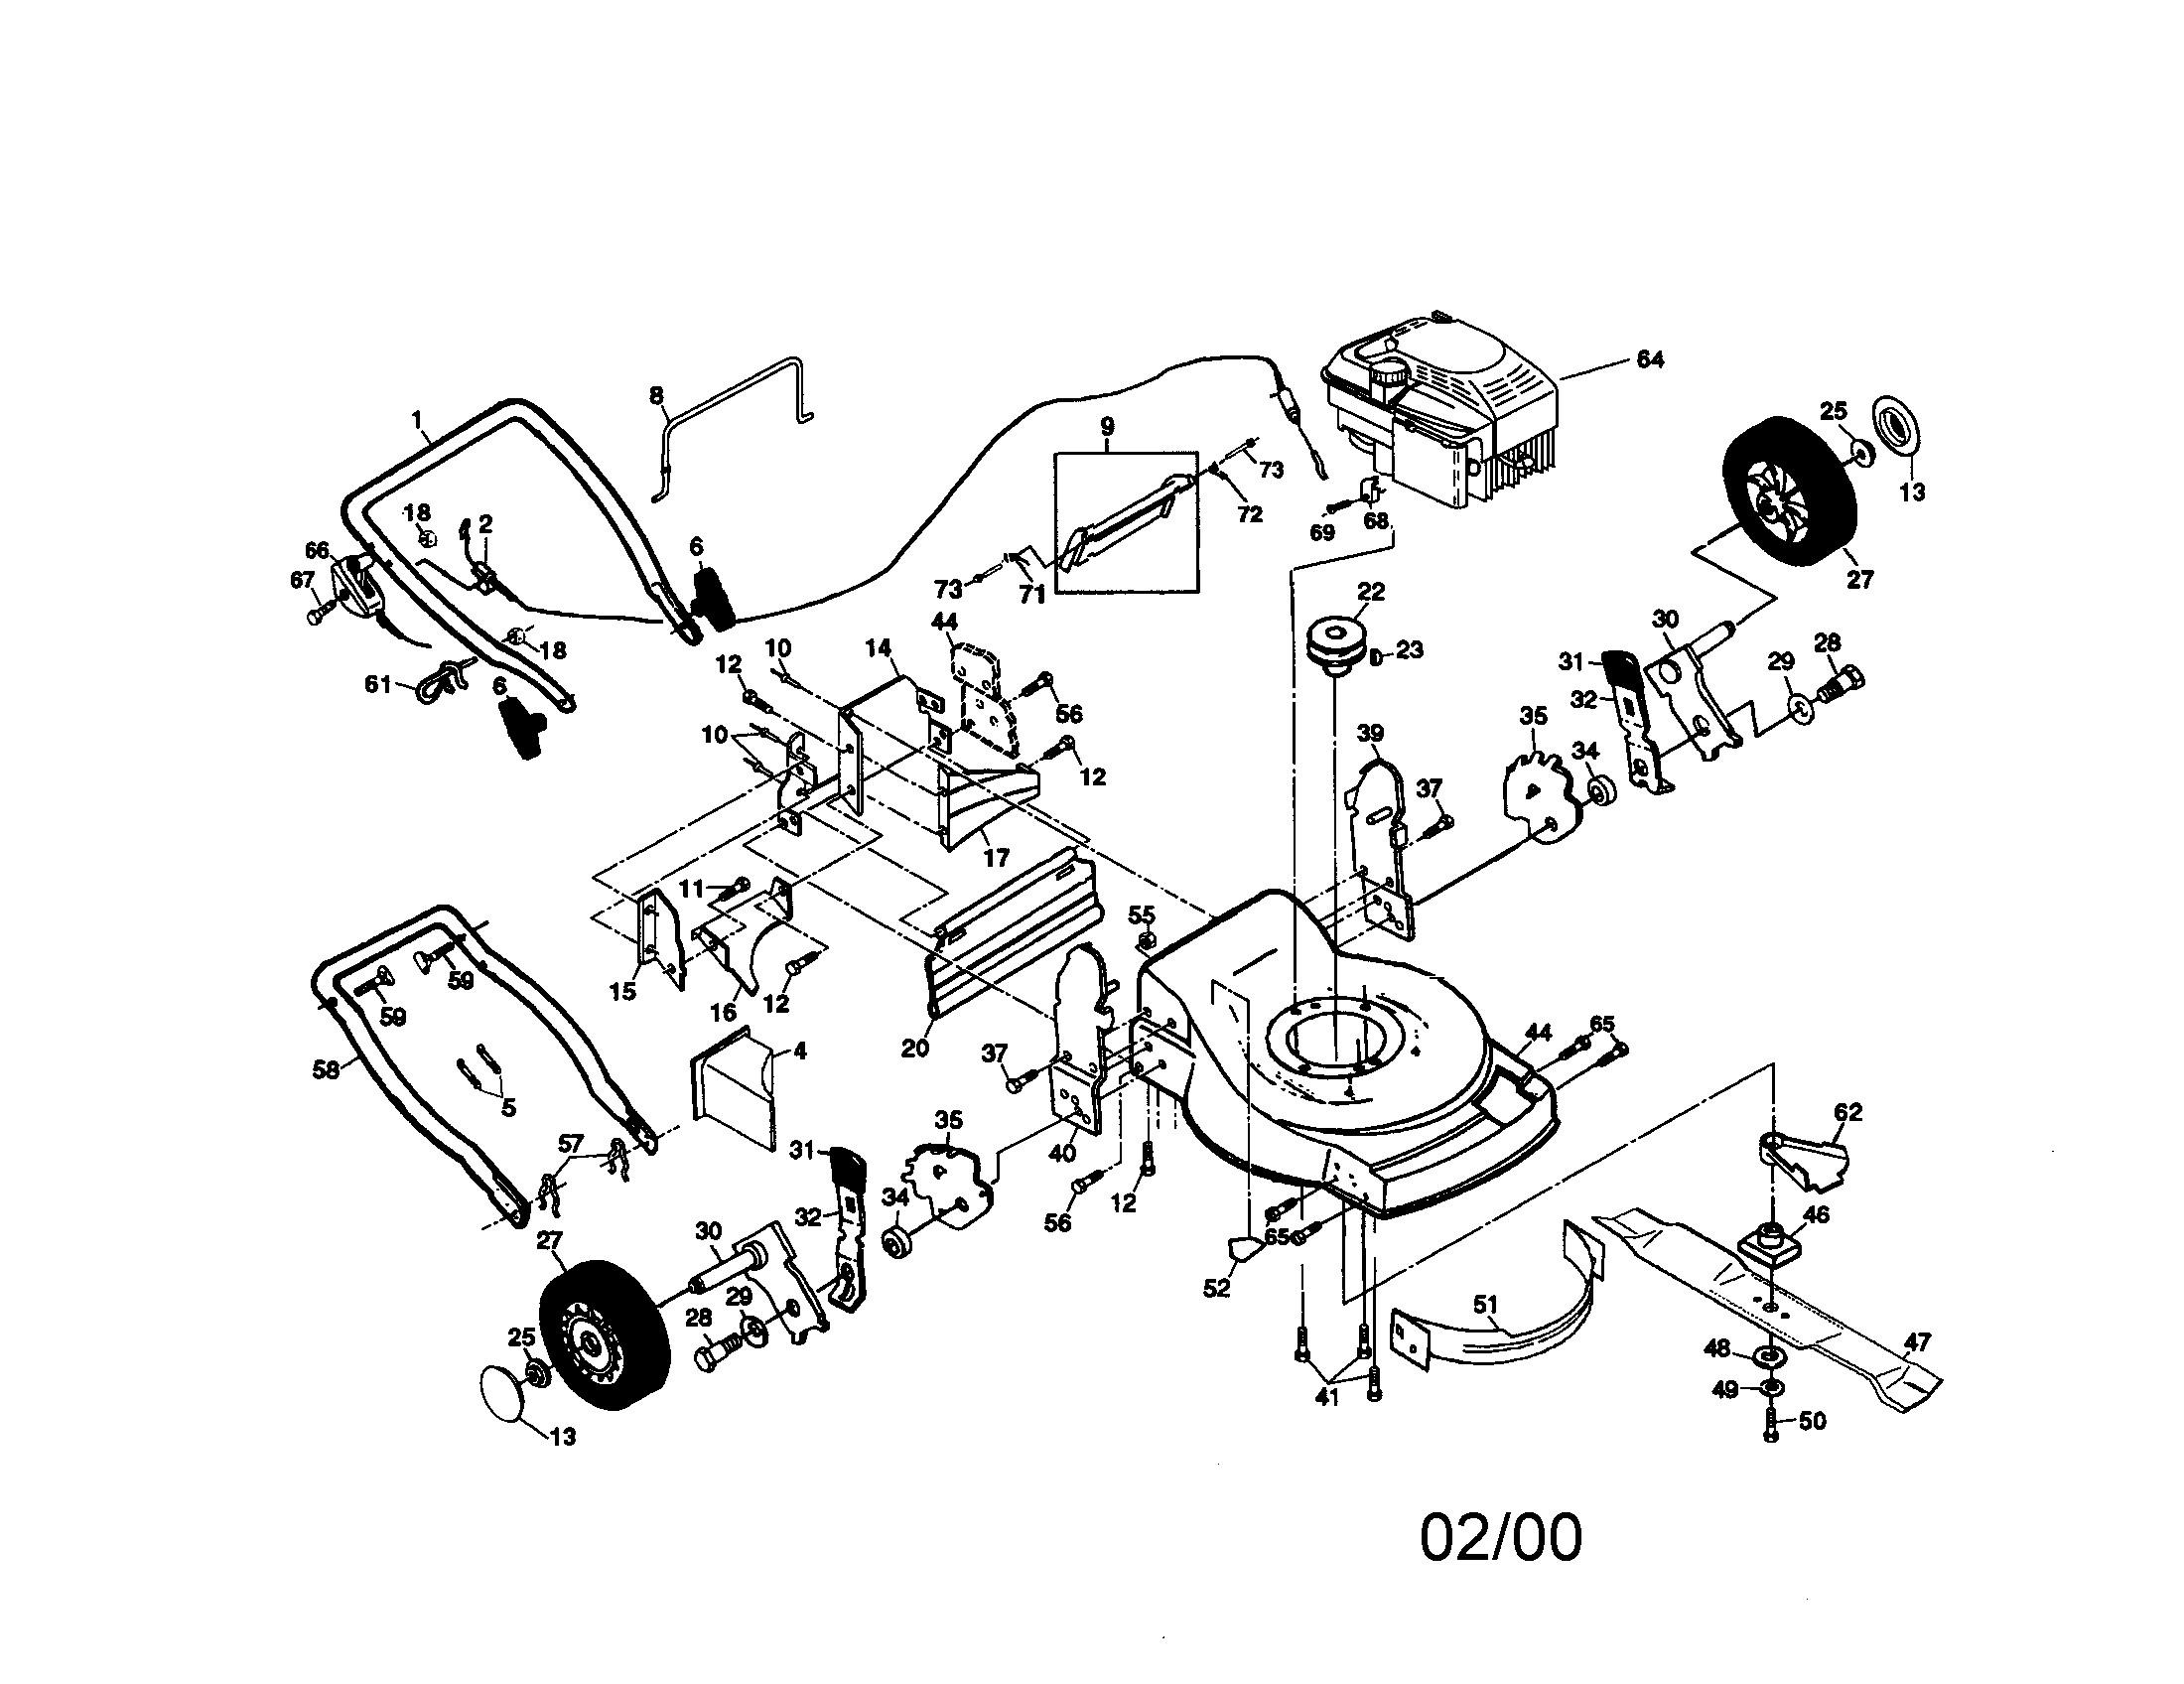 Craftsman Lawn Mower Engine Parts Diagram 917 Craftsman 6 Hp 22 Inch Rear Discharge Lawn Mower Of Craftsman Lawn Mower Engine Parts Diagram